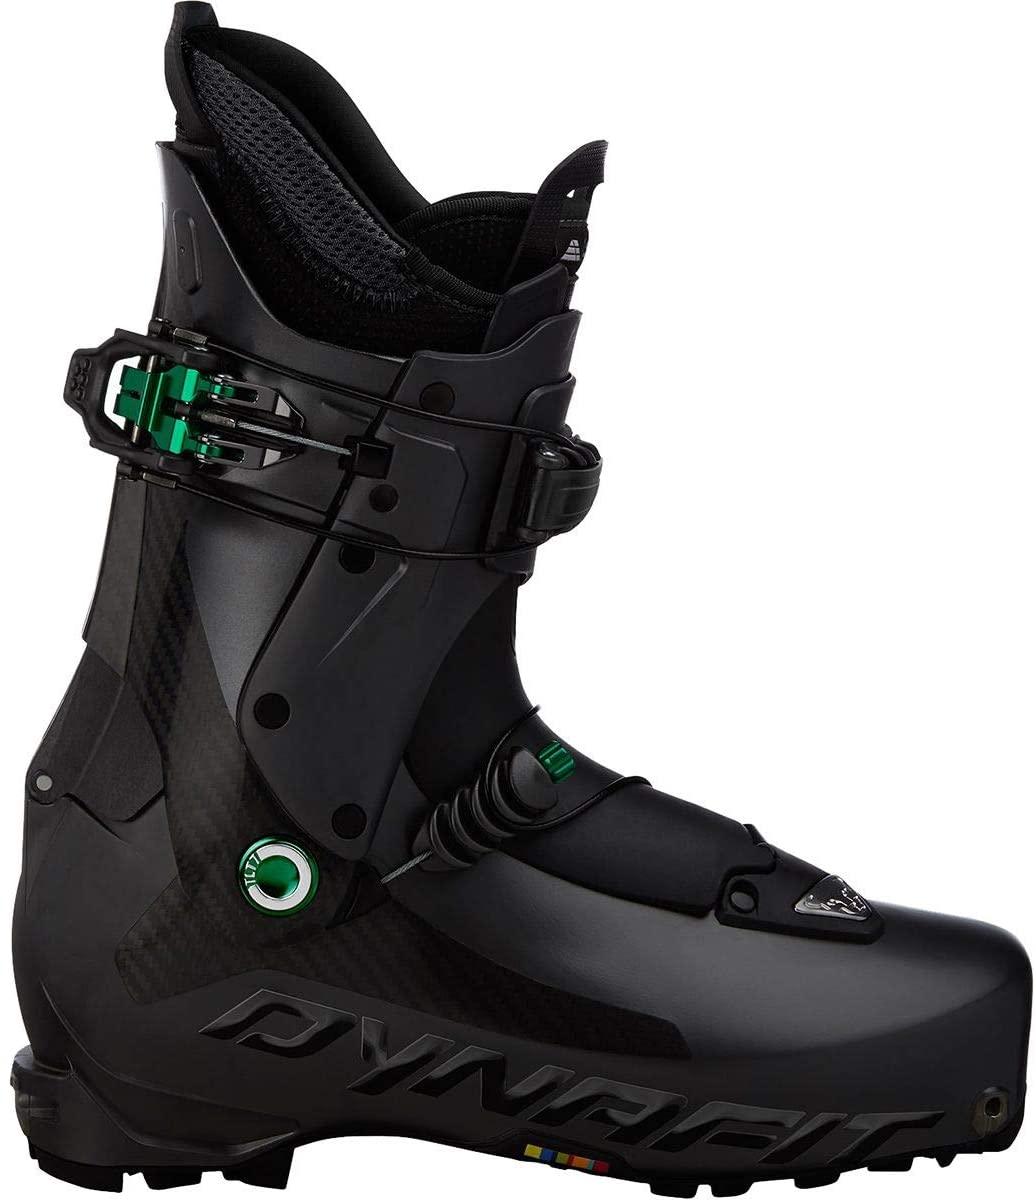 Dynafit TLT7 Carbonio Ski Boot, Carbon/Green, 26.5, 08-000006160226.5